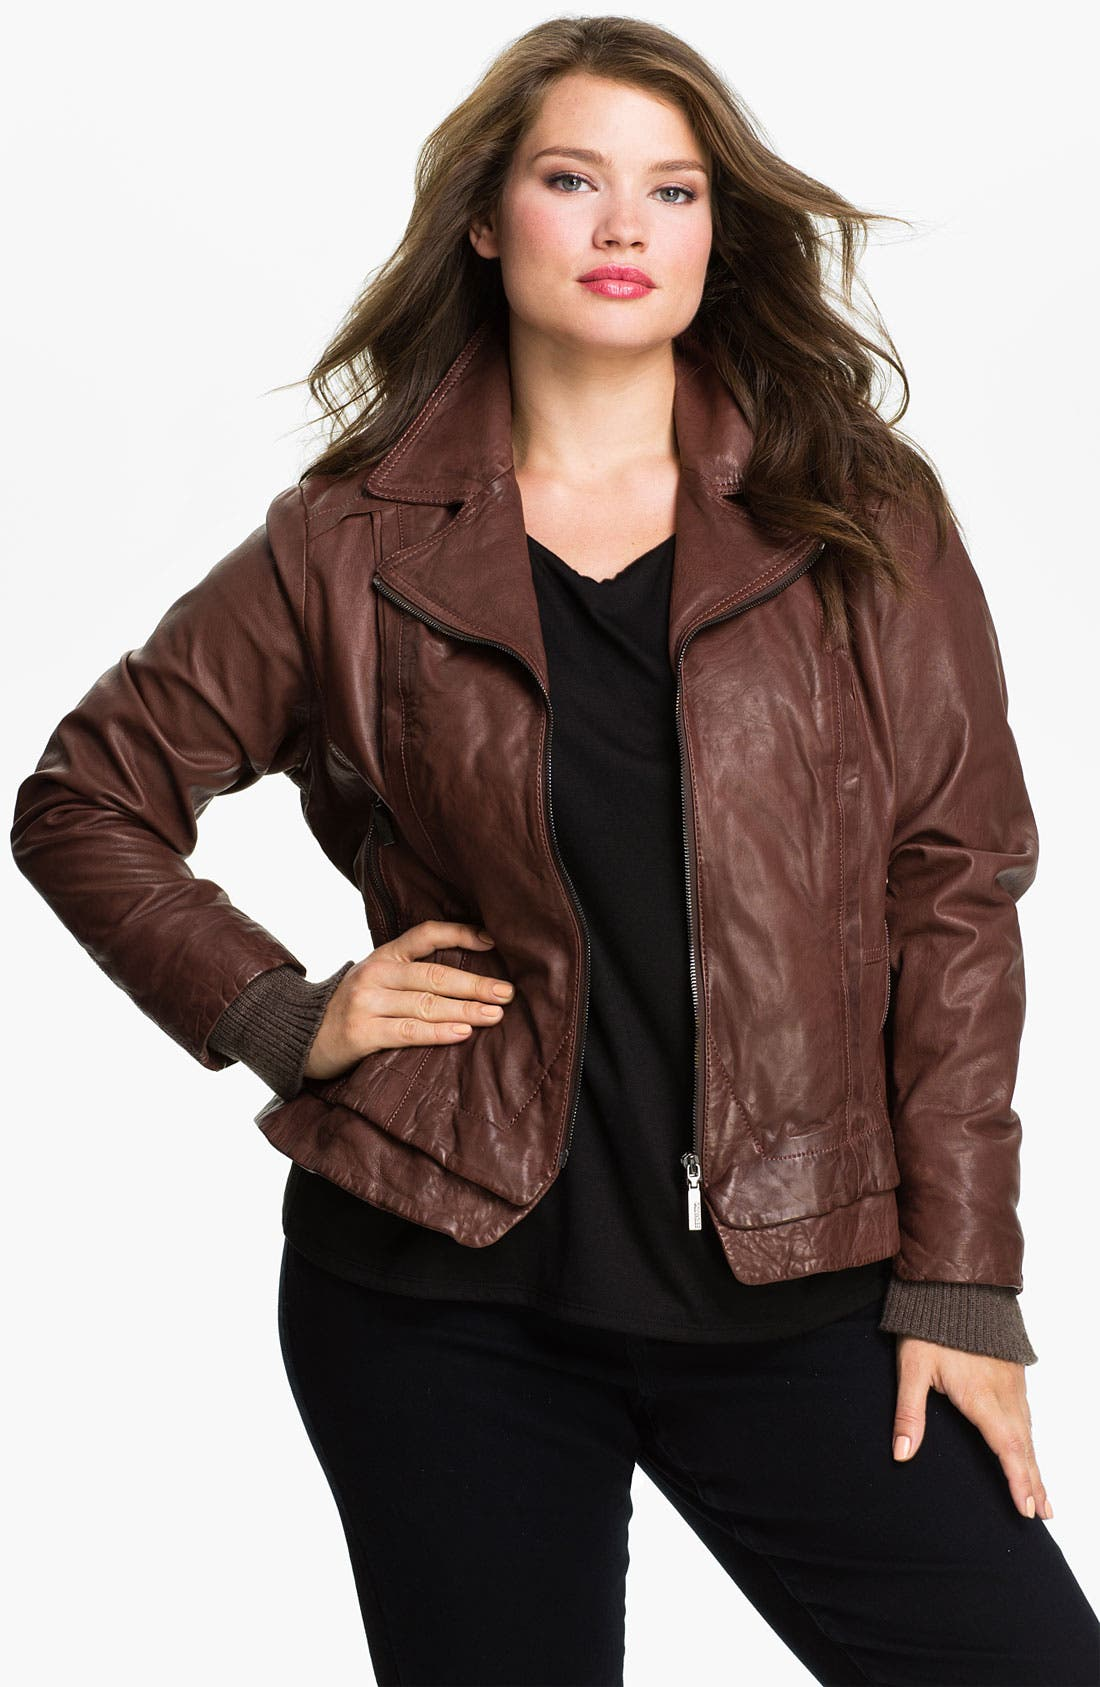 Alternate Image 1 Selected - Bernardo Knit Cuff Leather Jacket (Plus)